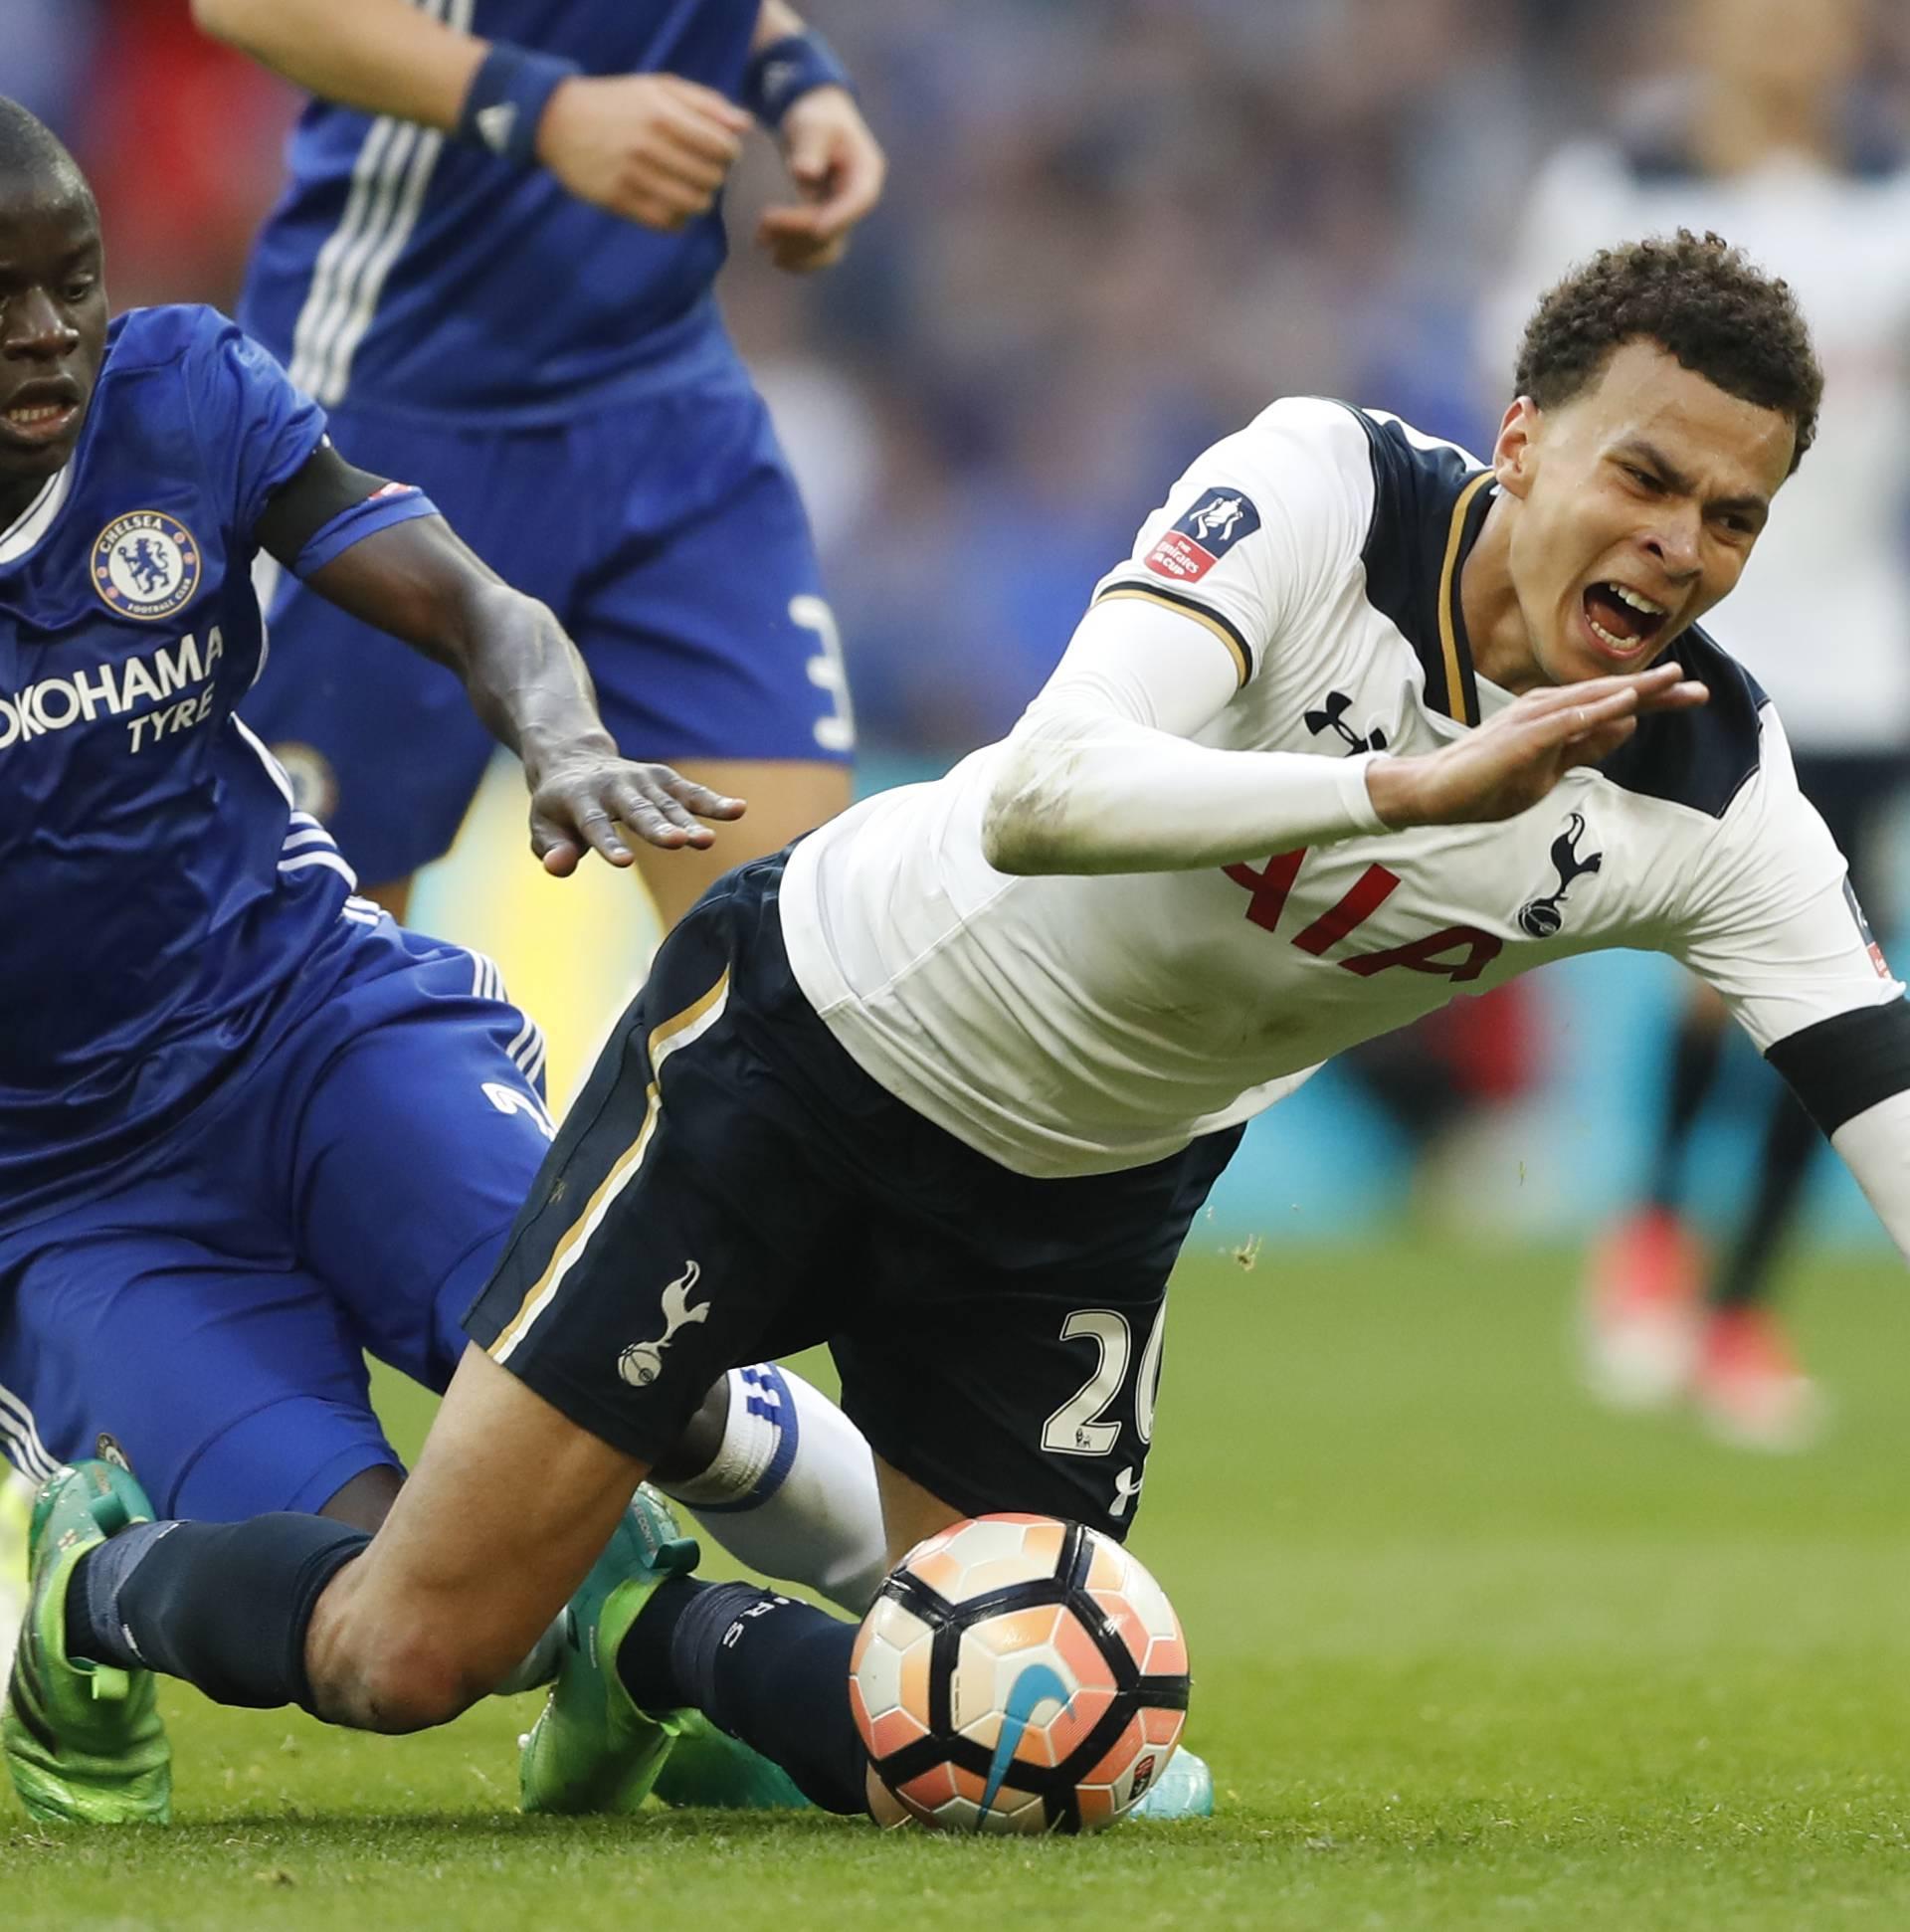 Chelsea's N'Golo Kante fouls Tottenham's Dele Alli